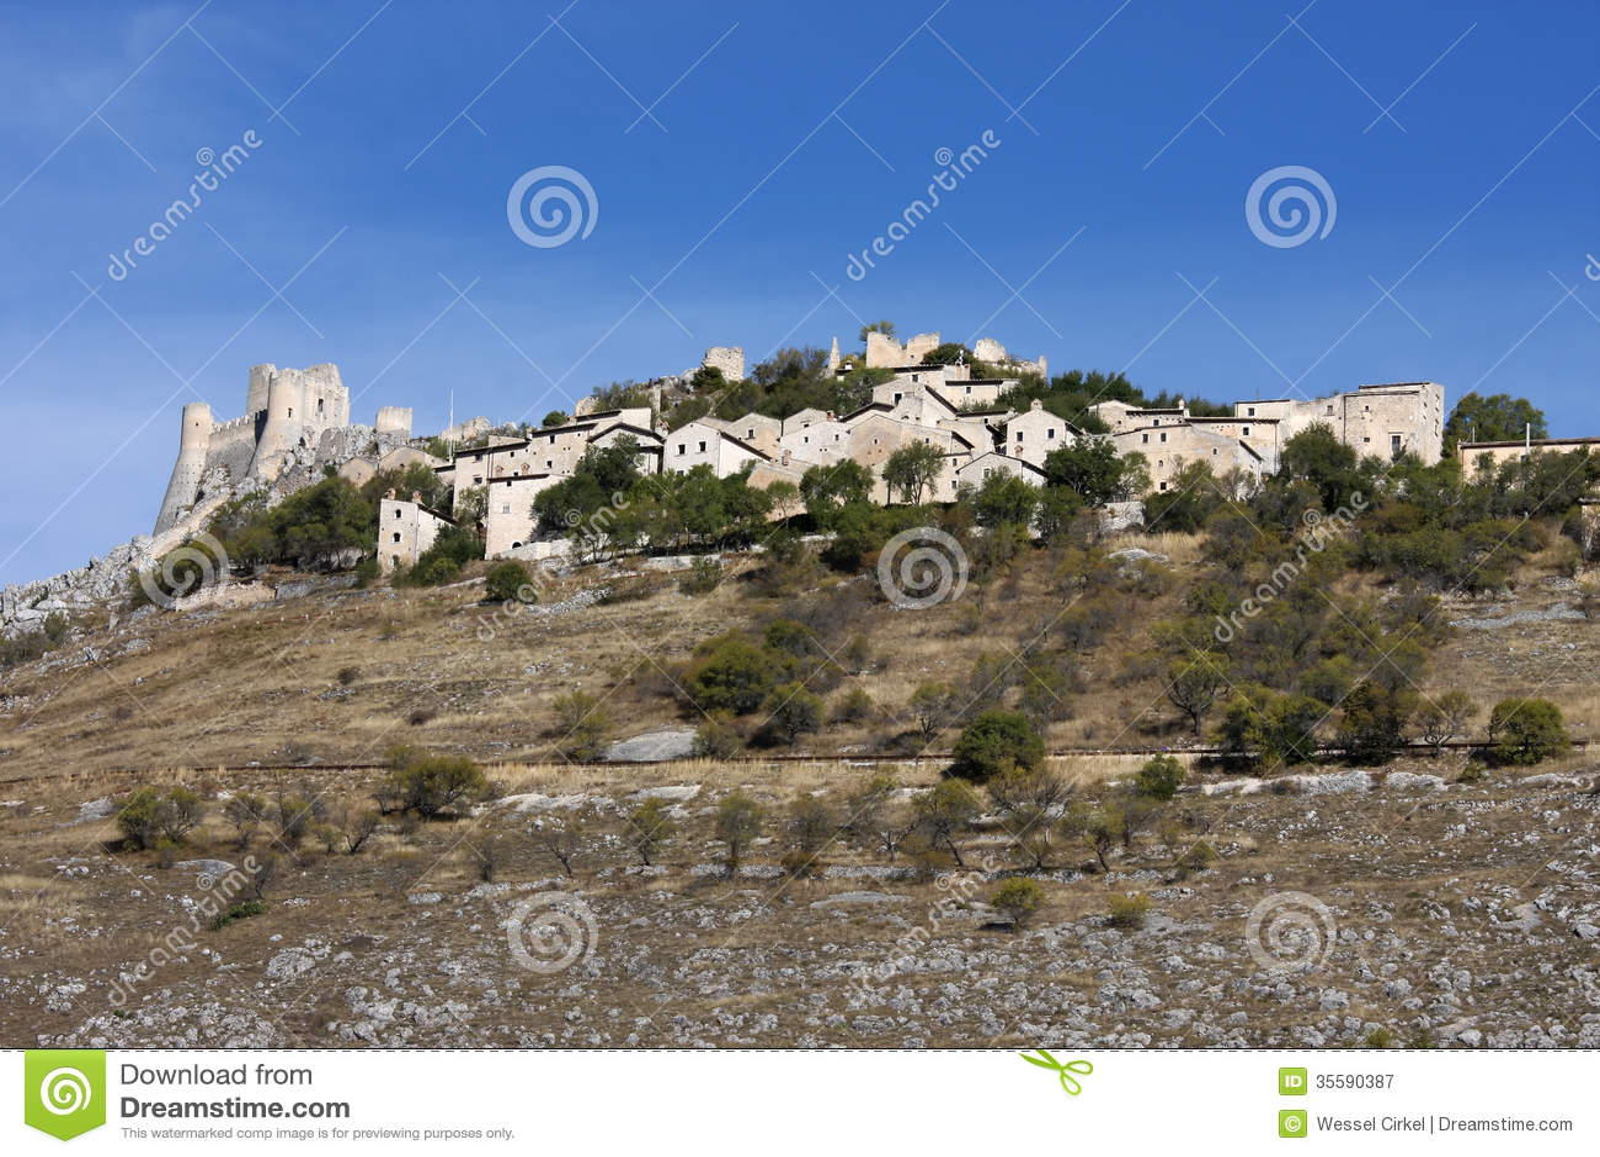 Fortress of Rocca Calascio, Apennines, Italy